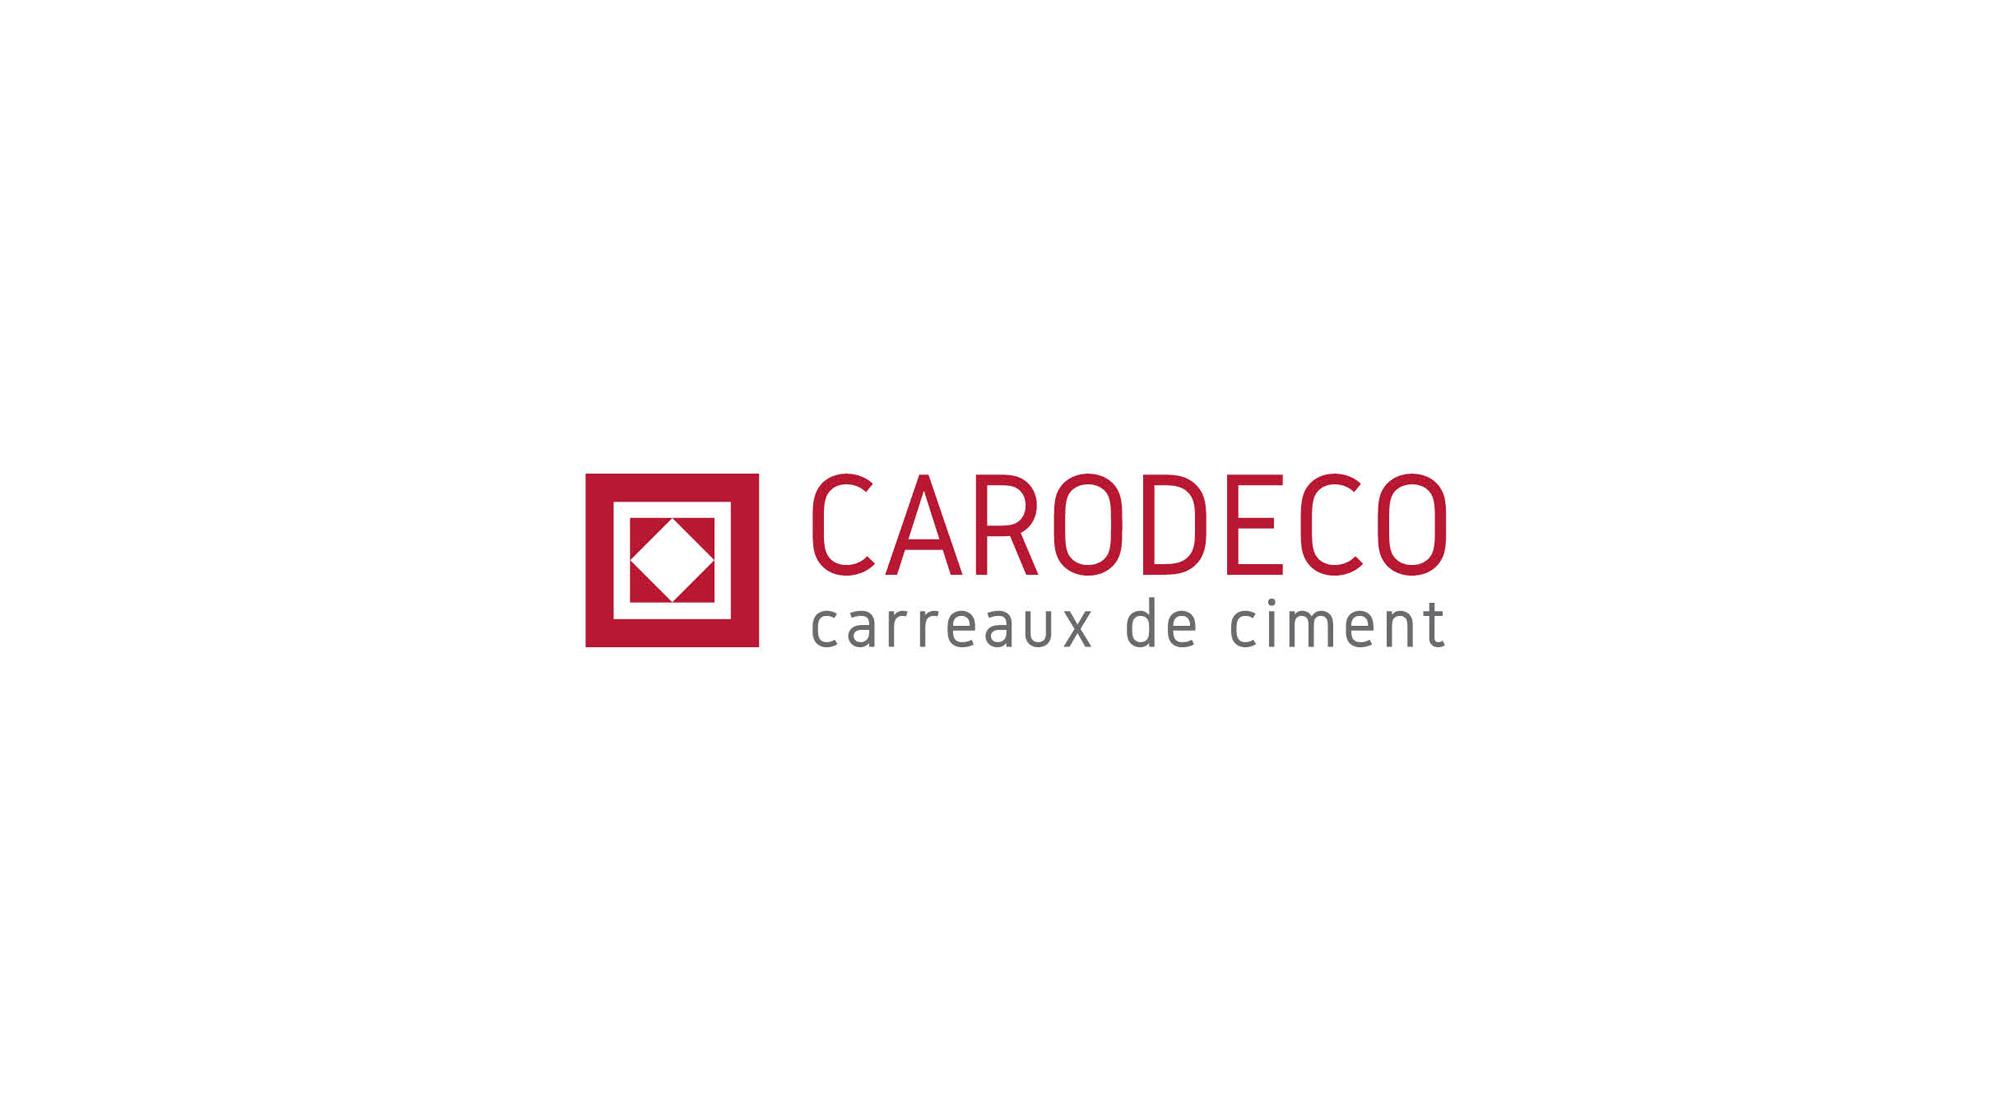 realisation-1- carodeco